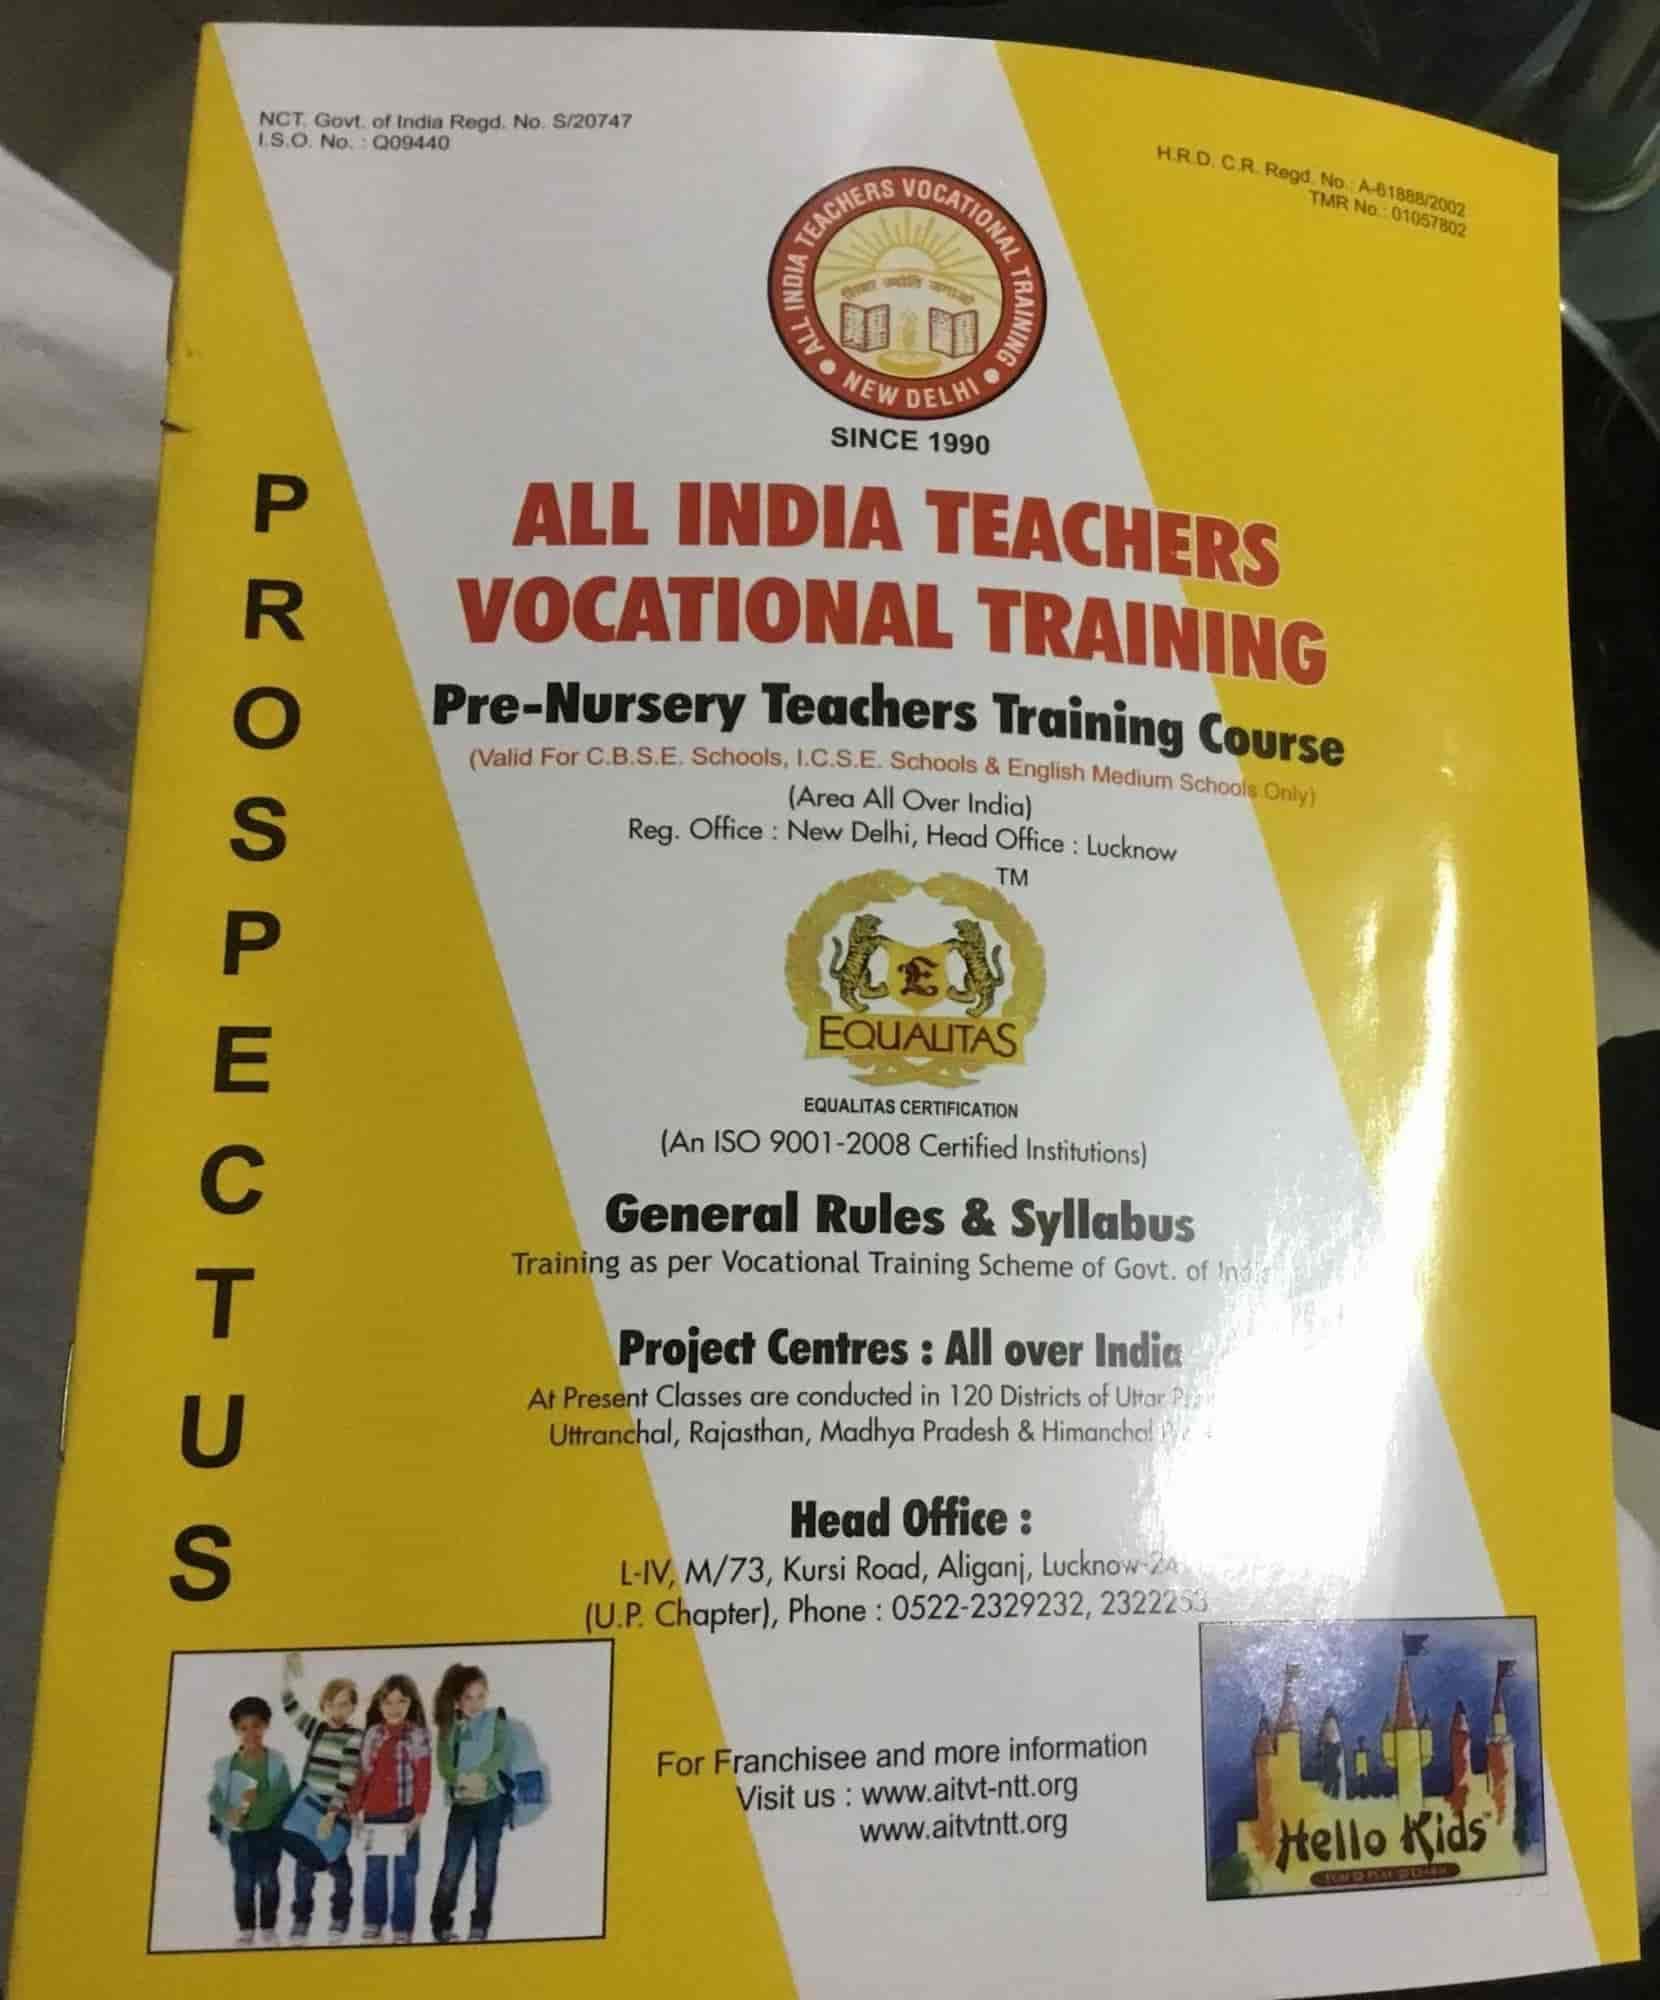 All India Teachers Vocational Training Ntt Photos Aliganj Lucknow